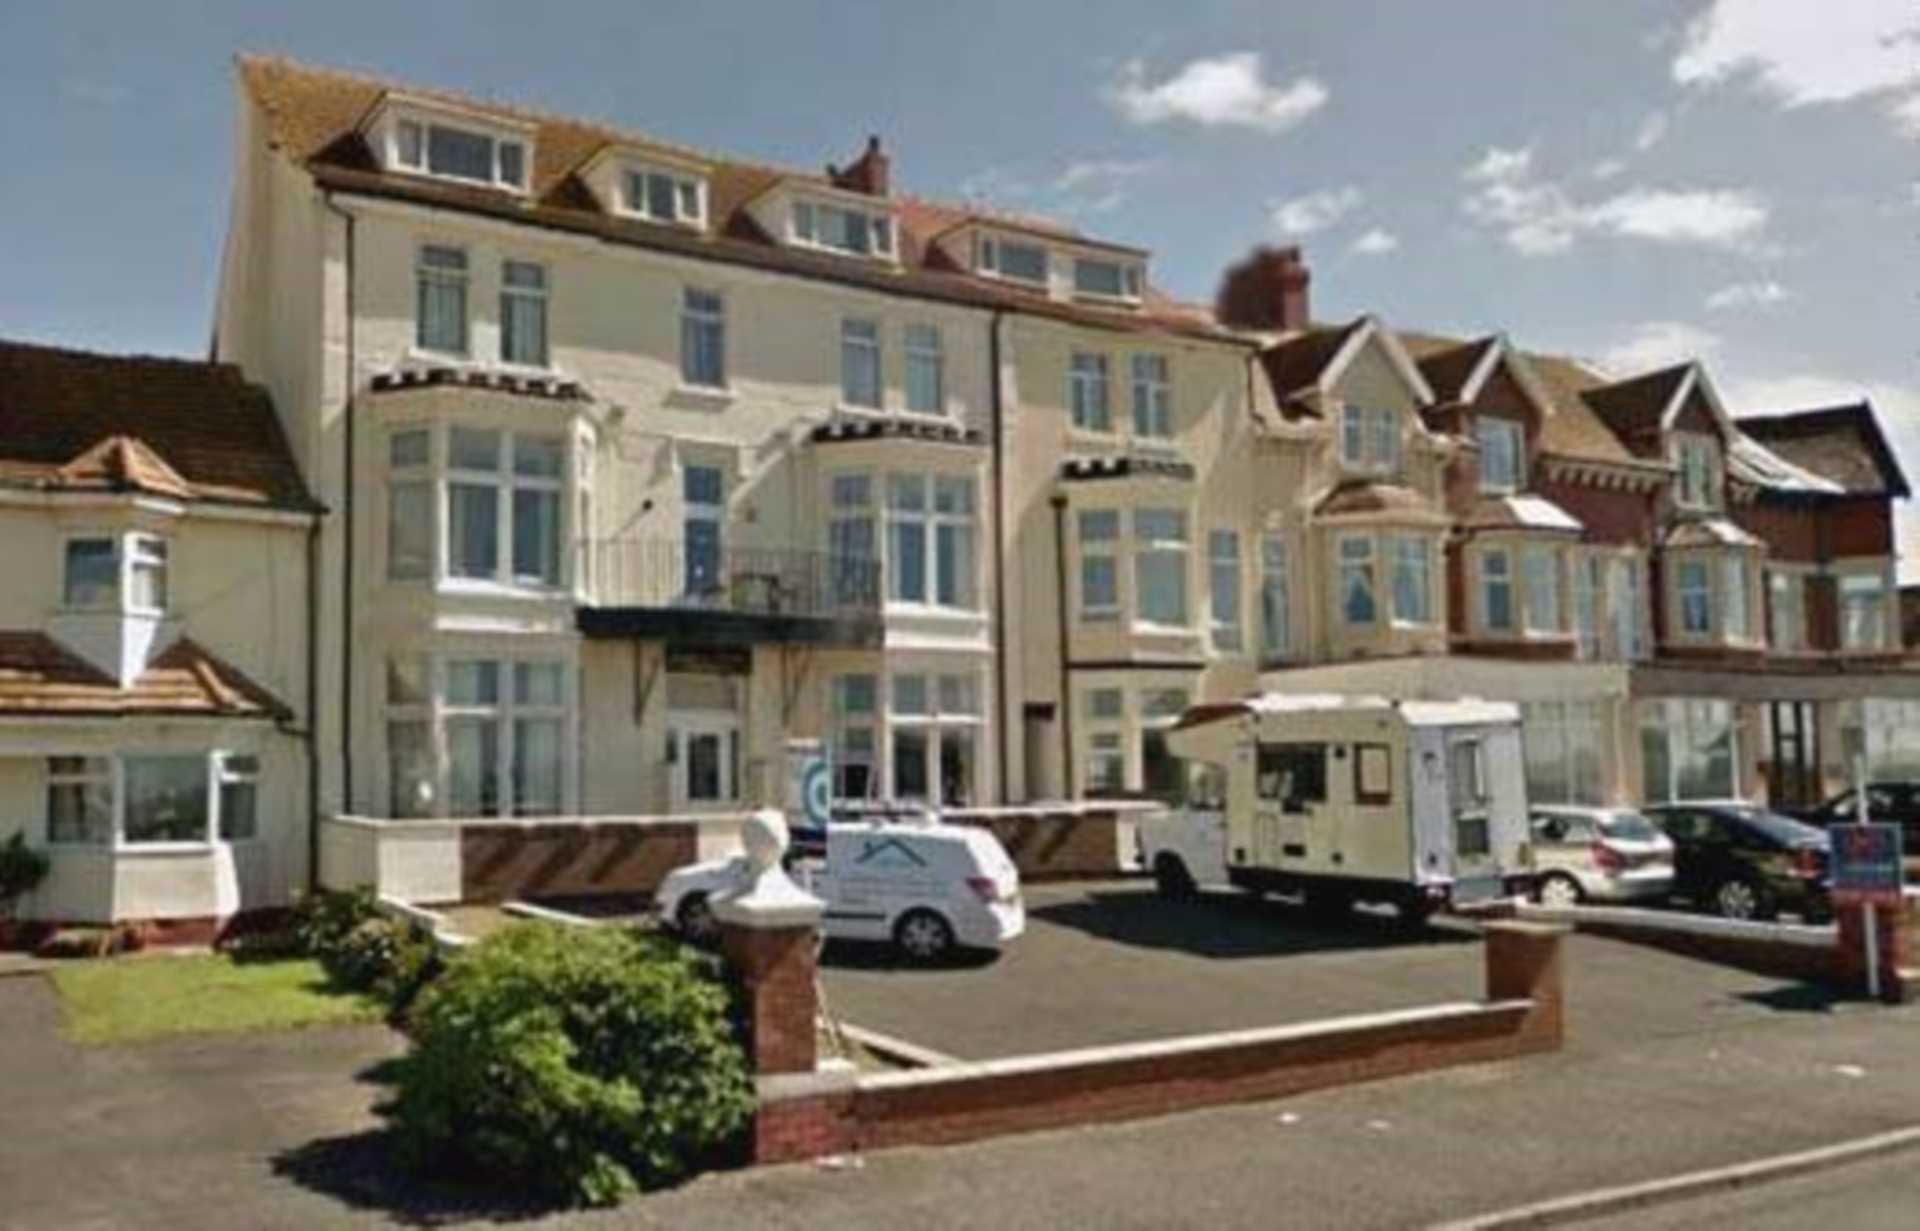 Dales View, Queens Promenade, Blackpool, FY2 9AB, Image 14